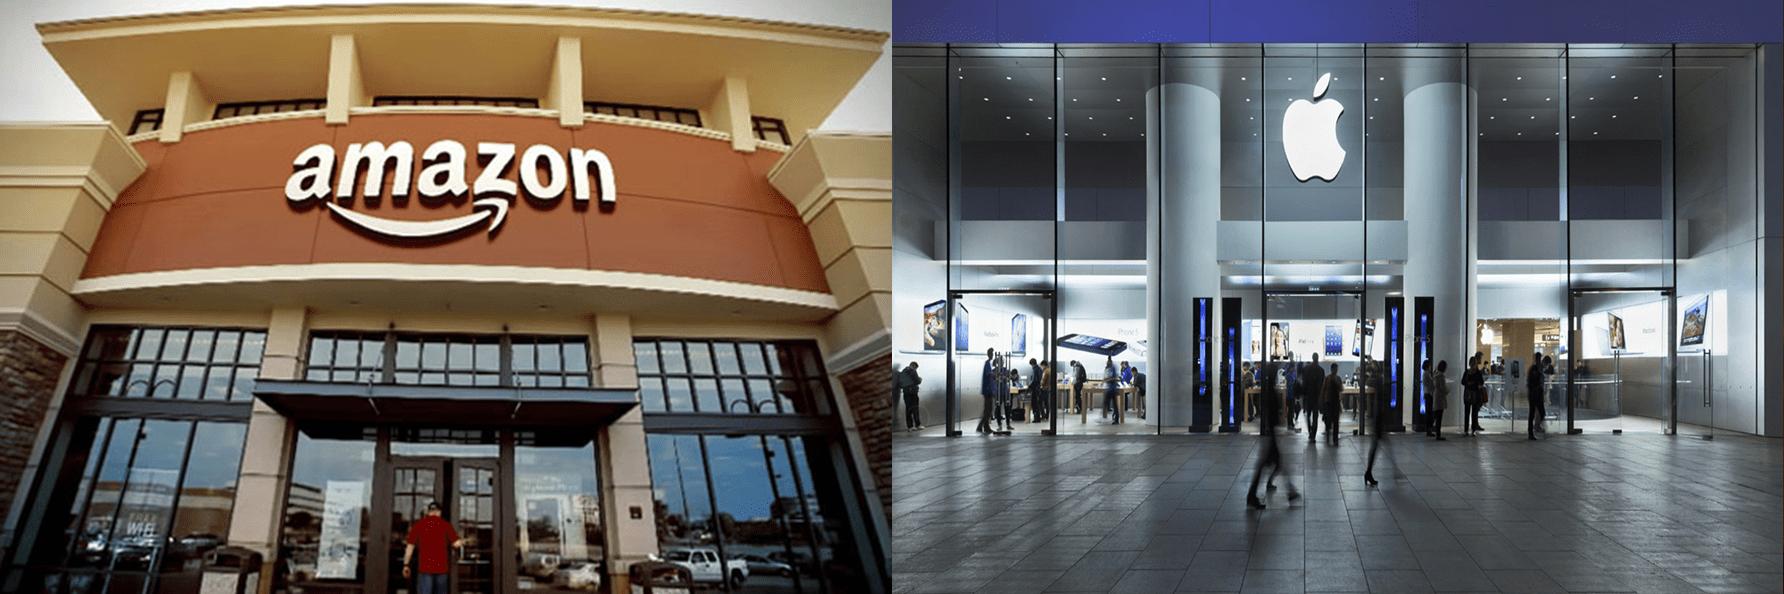 Amazon y Apple